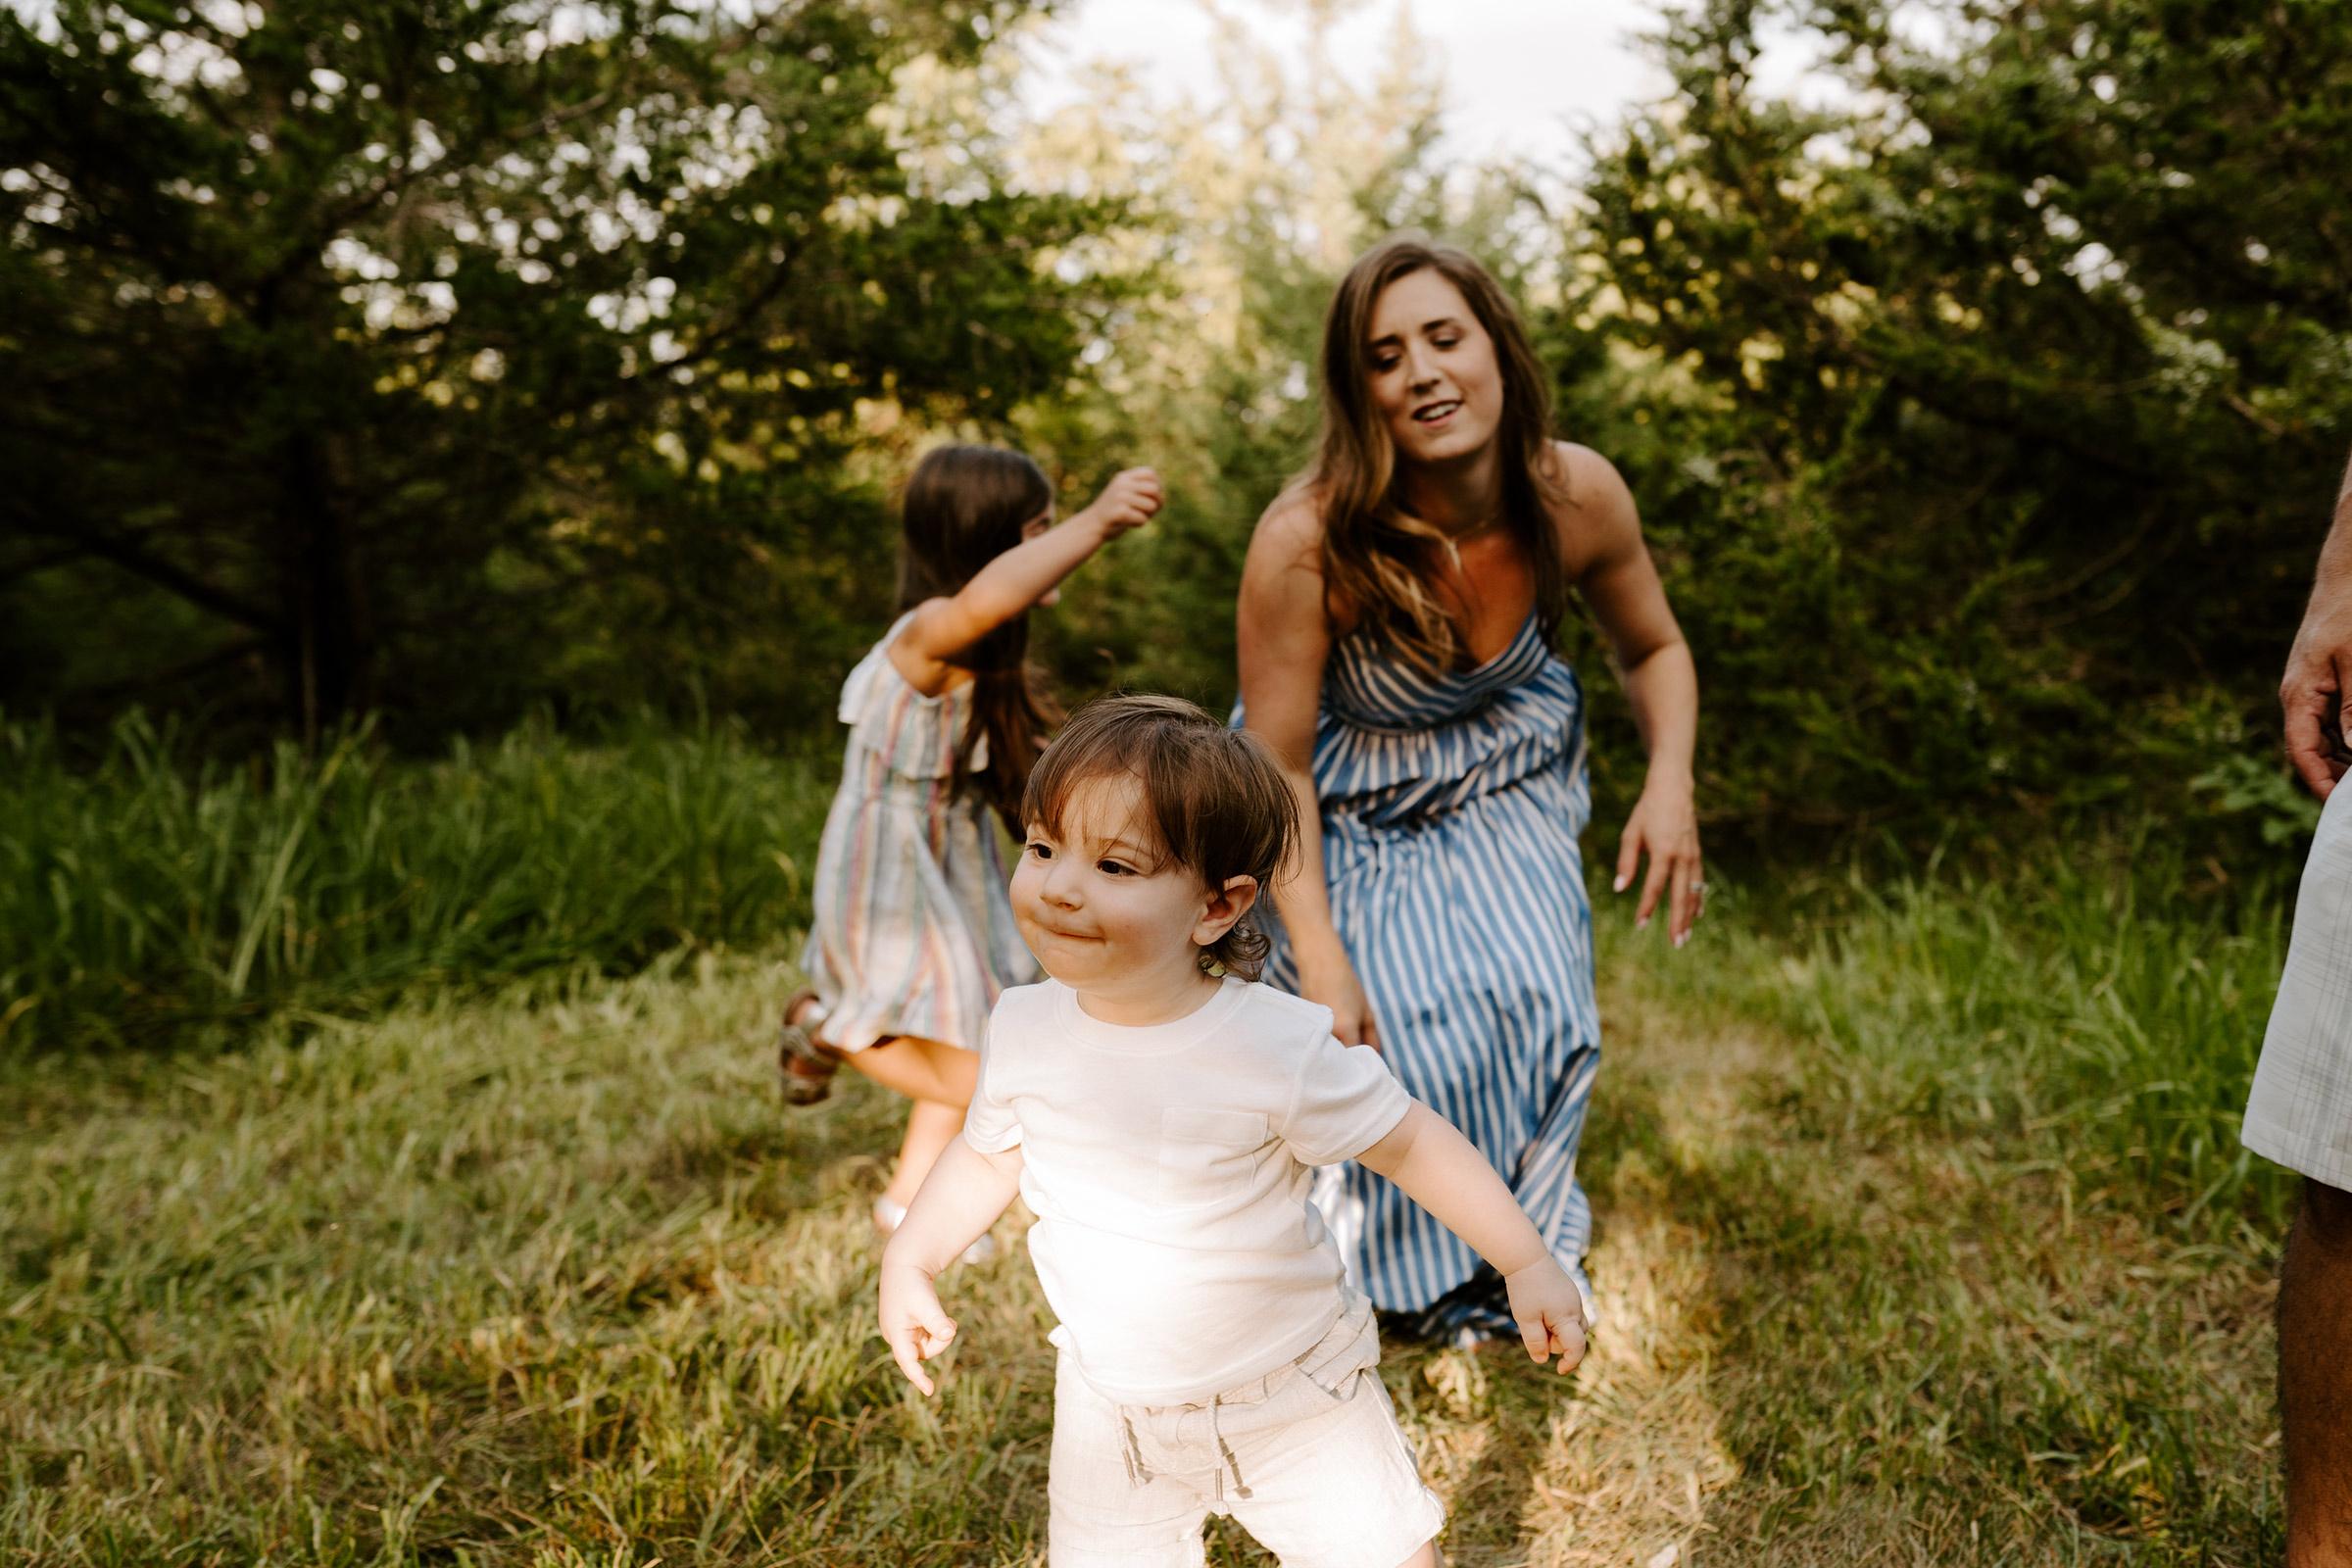 natale-family-mom-chasing-son-iris-aisle--winterset-iowa-raelyn-ramey-photography-96.jpg